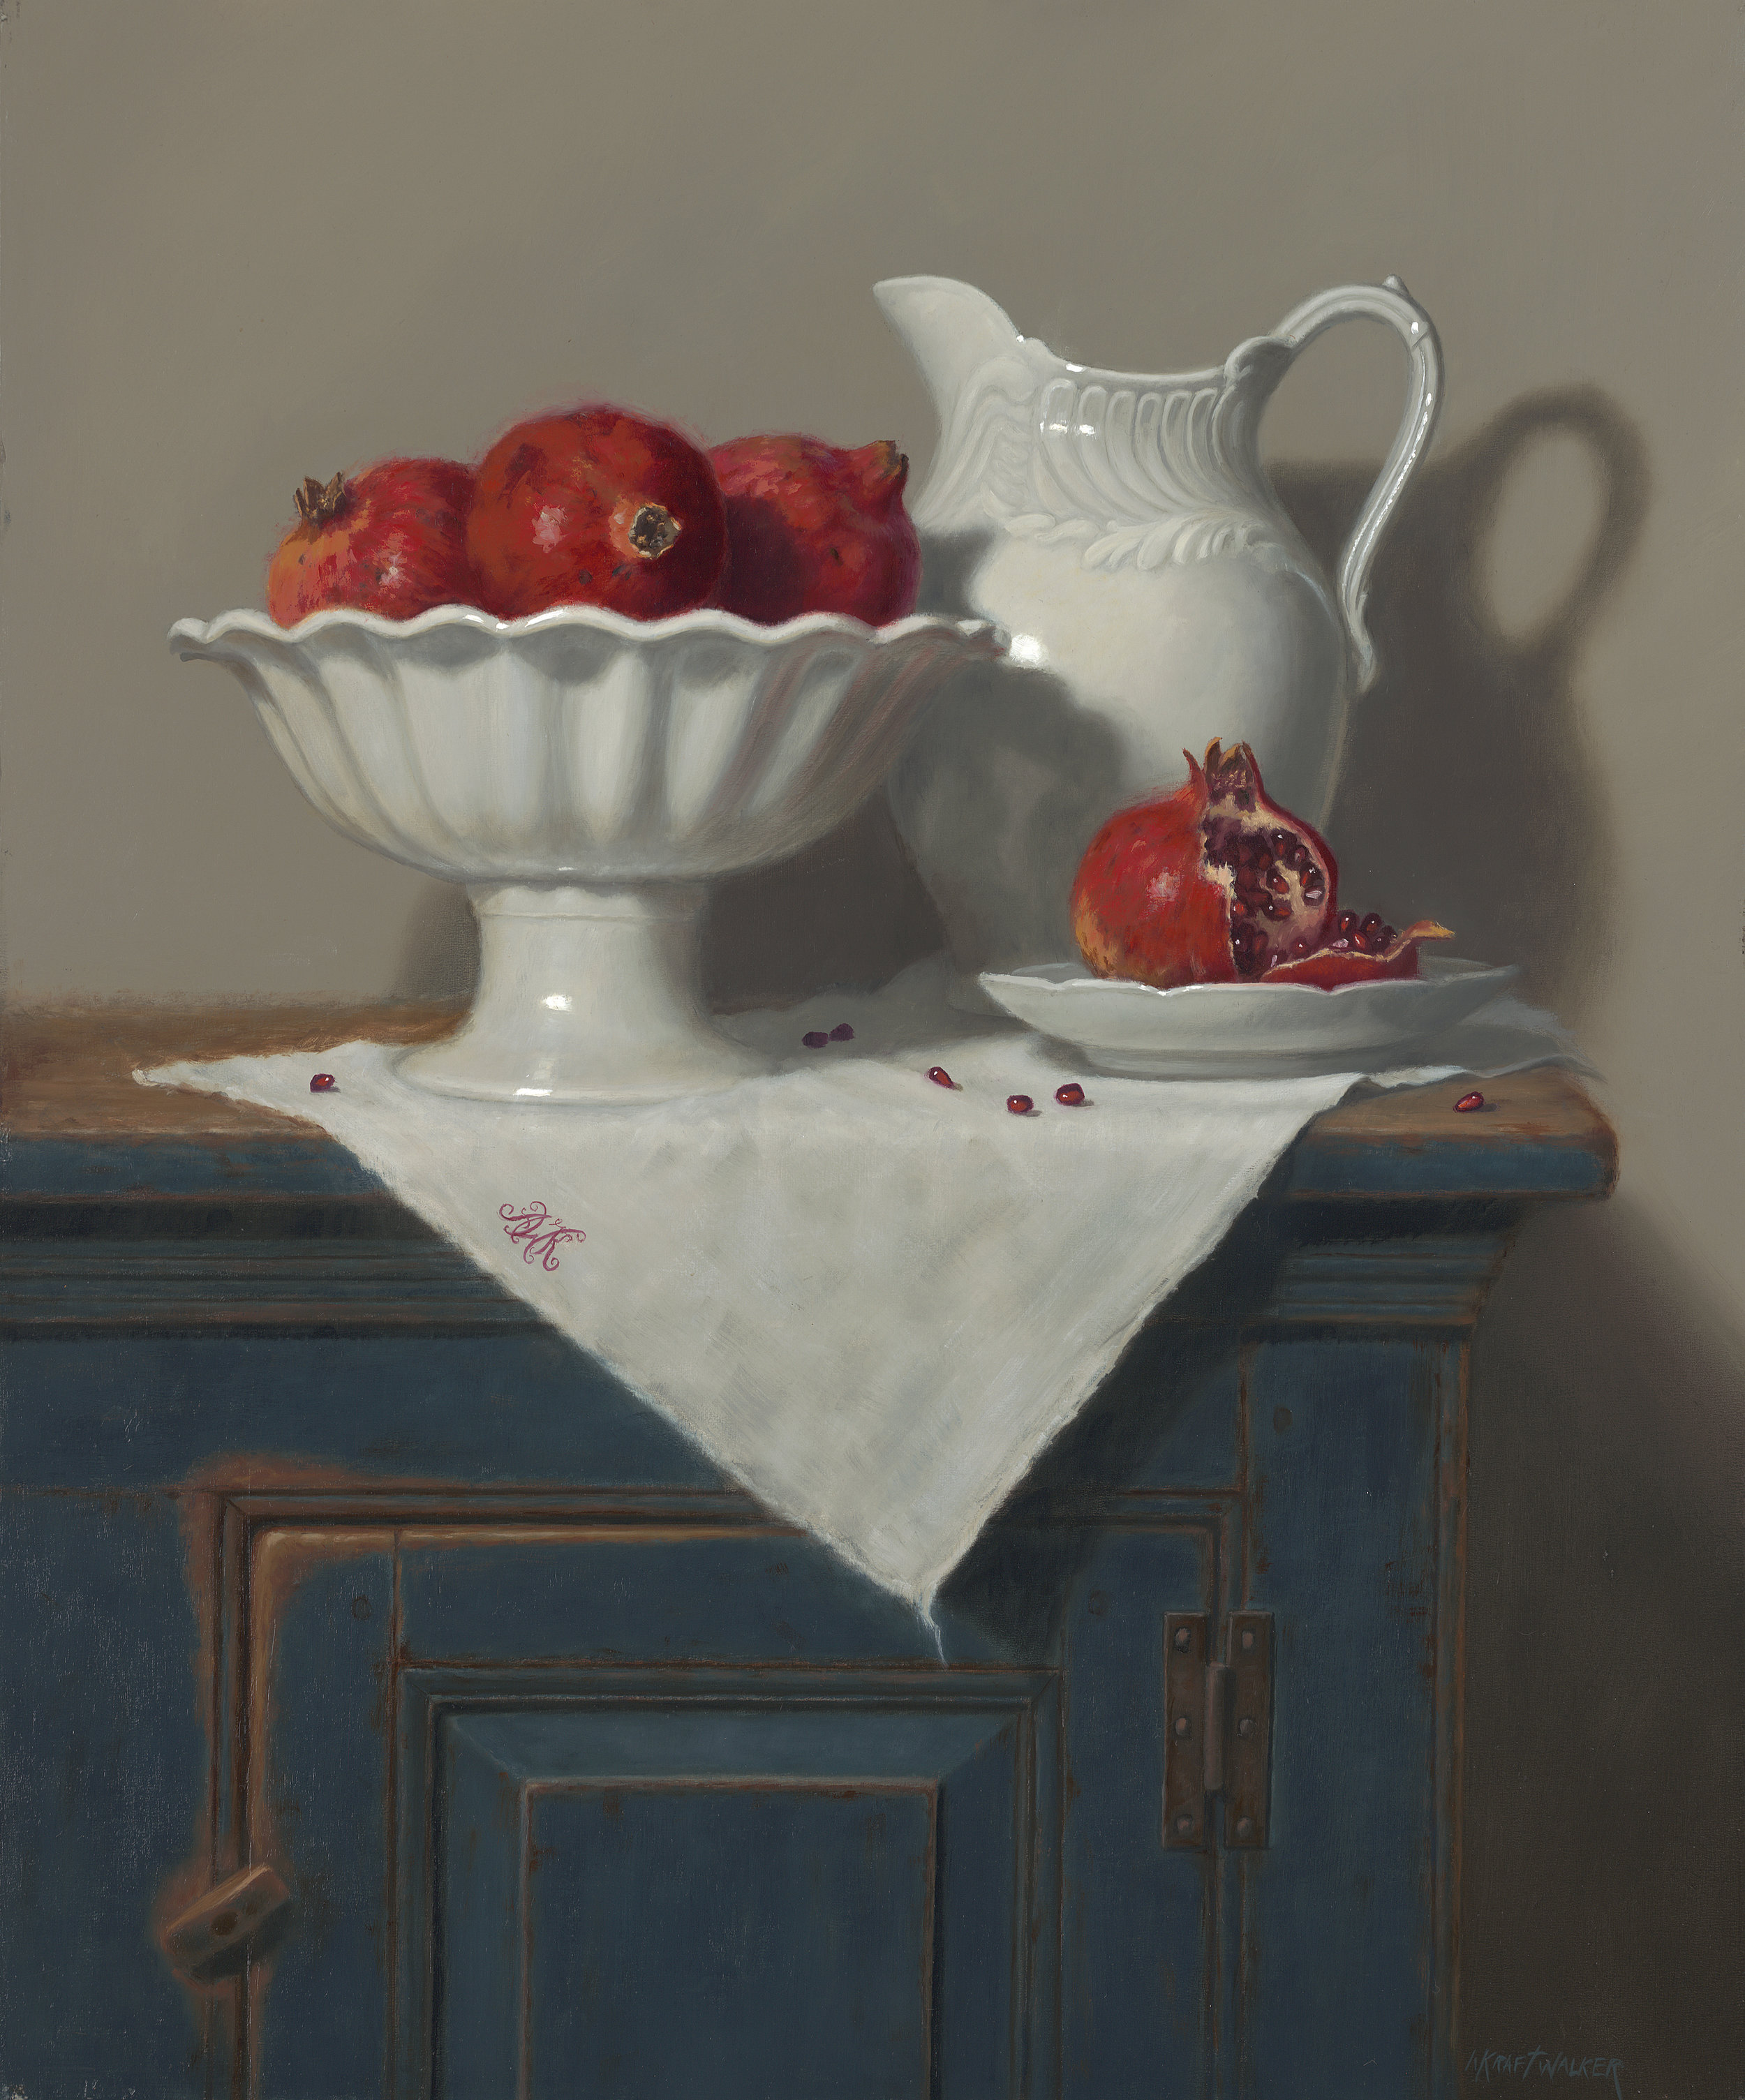 Ann Kraft Walker Title: White on White Size: 24 x 20 x 1 Price: NFS Medium: Oil